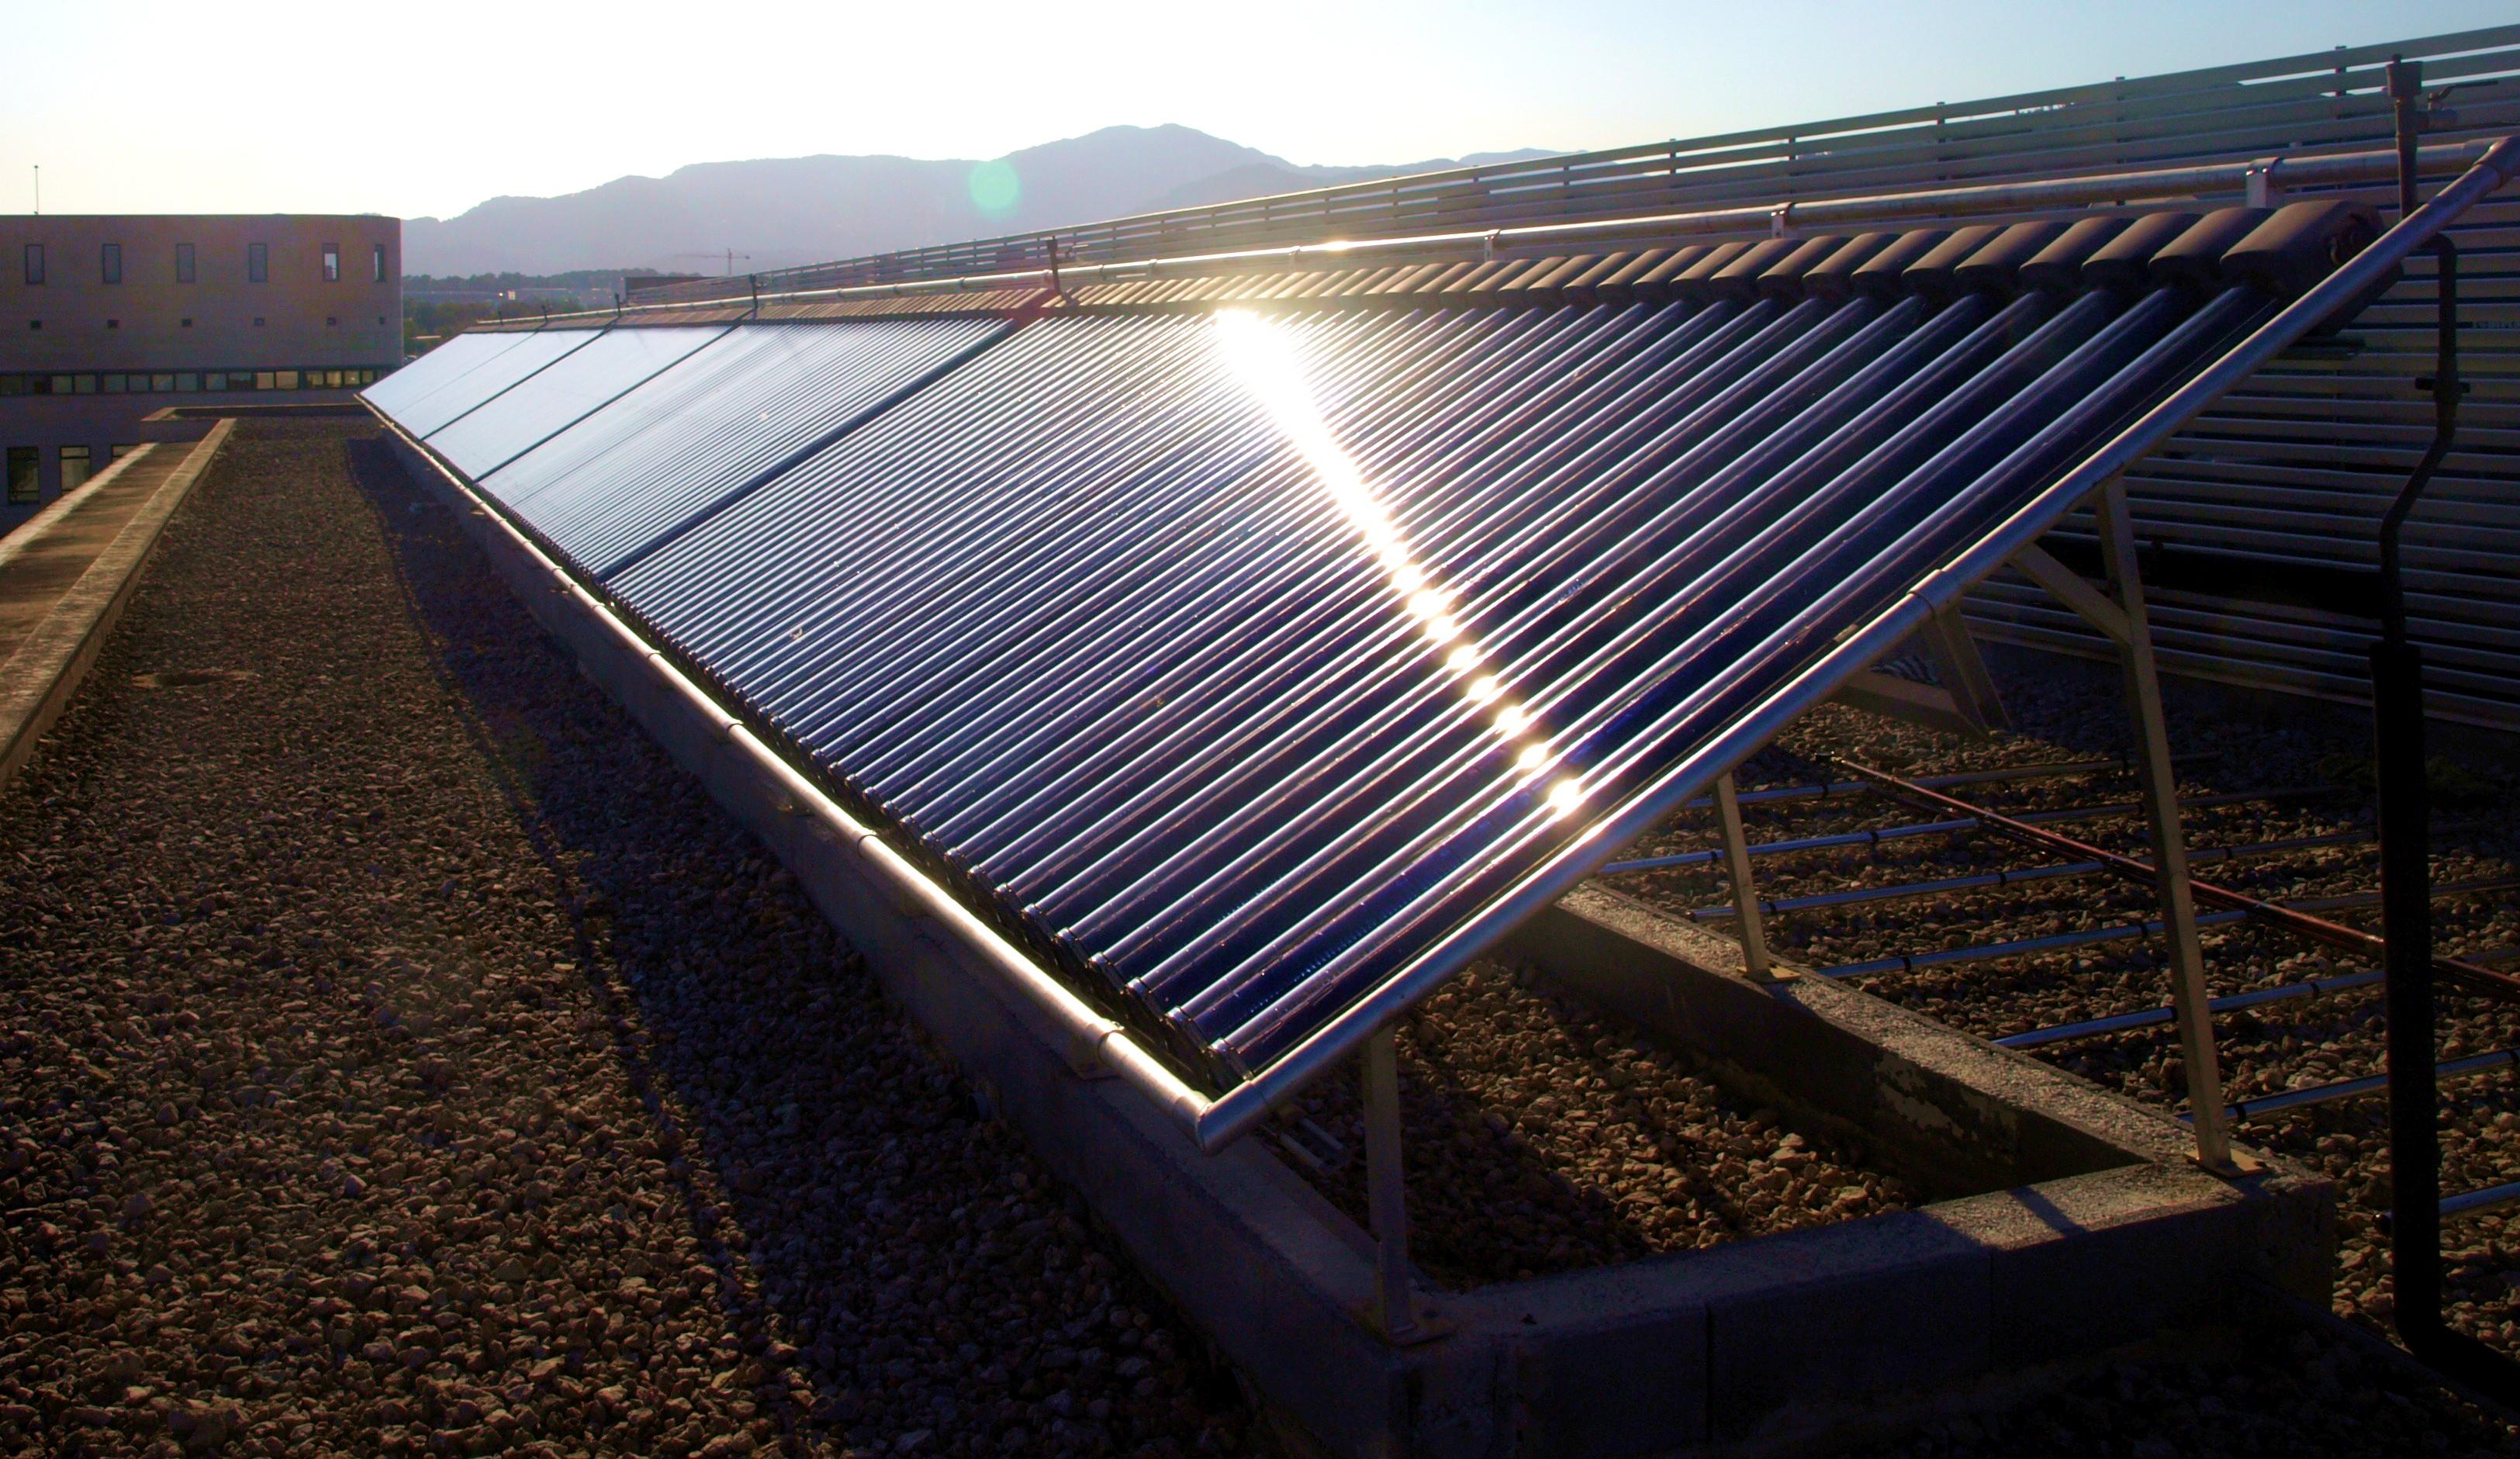 File:Col·lectors solars de tub de buit.JPG - Wikimedia Commons